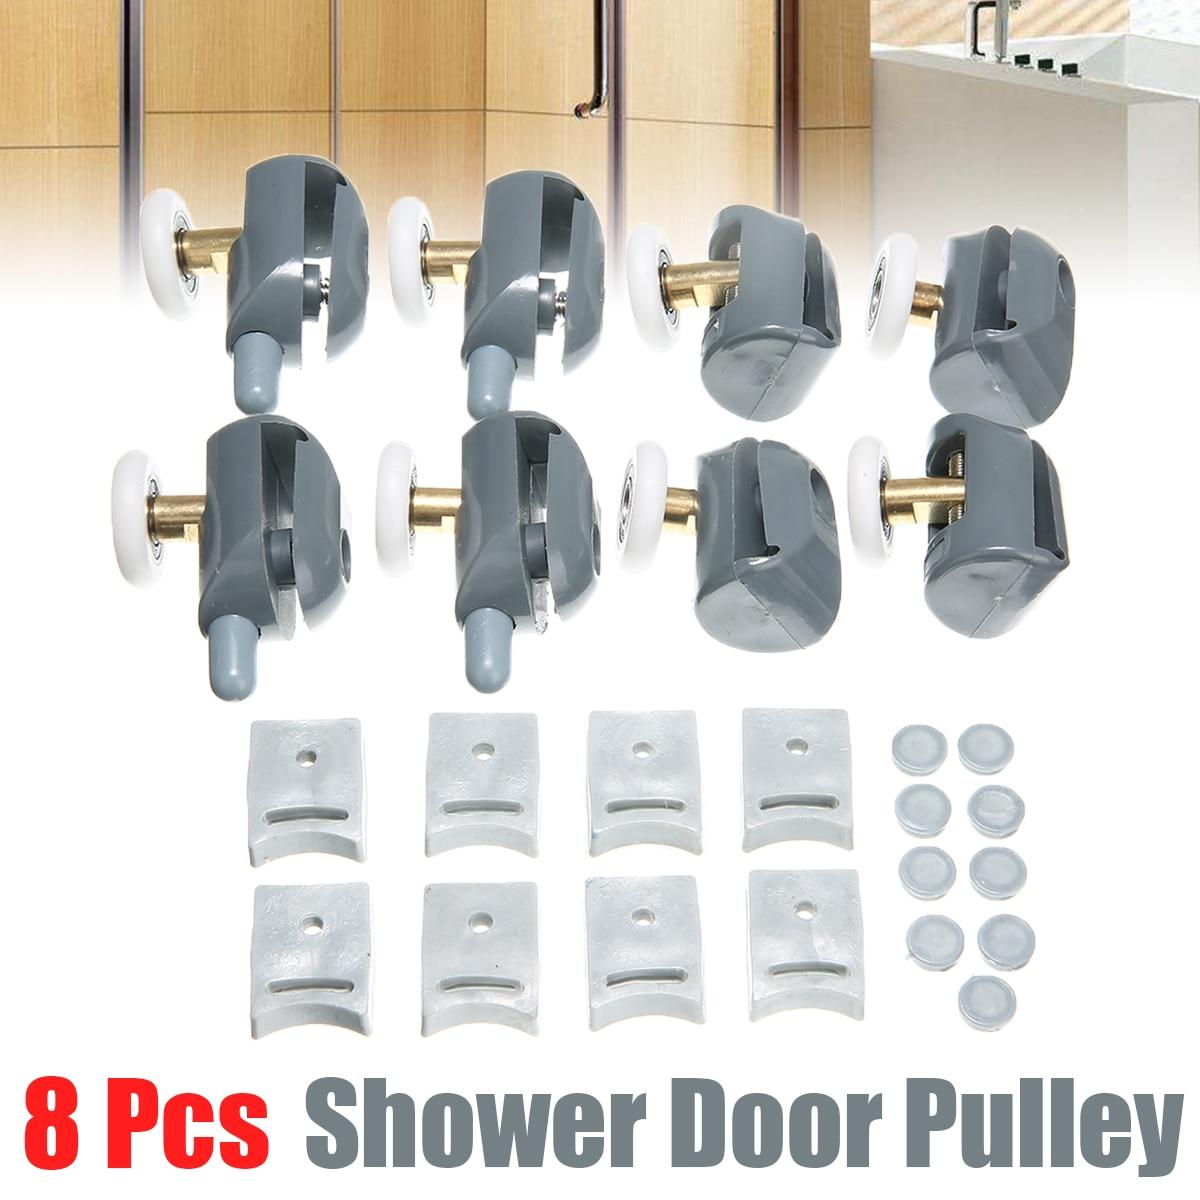 8Pcs/set Roller Wheels Bathroom Roller Wheel Runner Shower Room Accessories Bearing Roller Wheel With Block Set 23mm